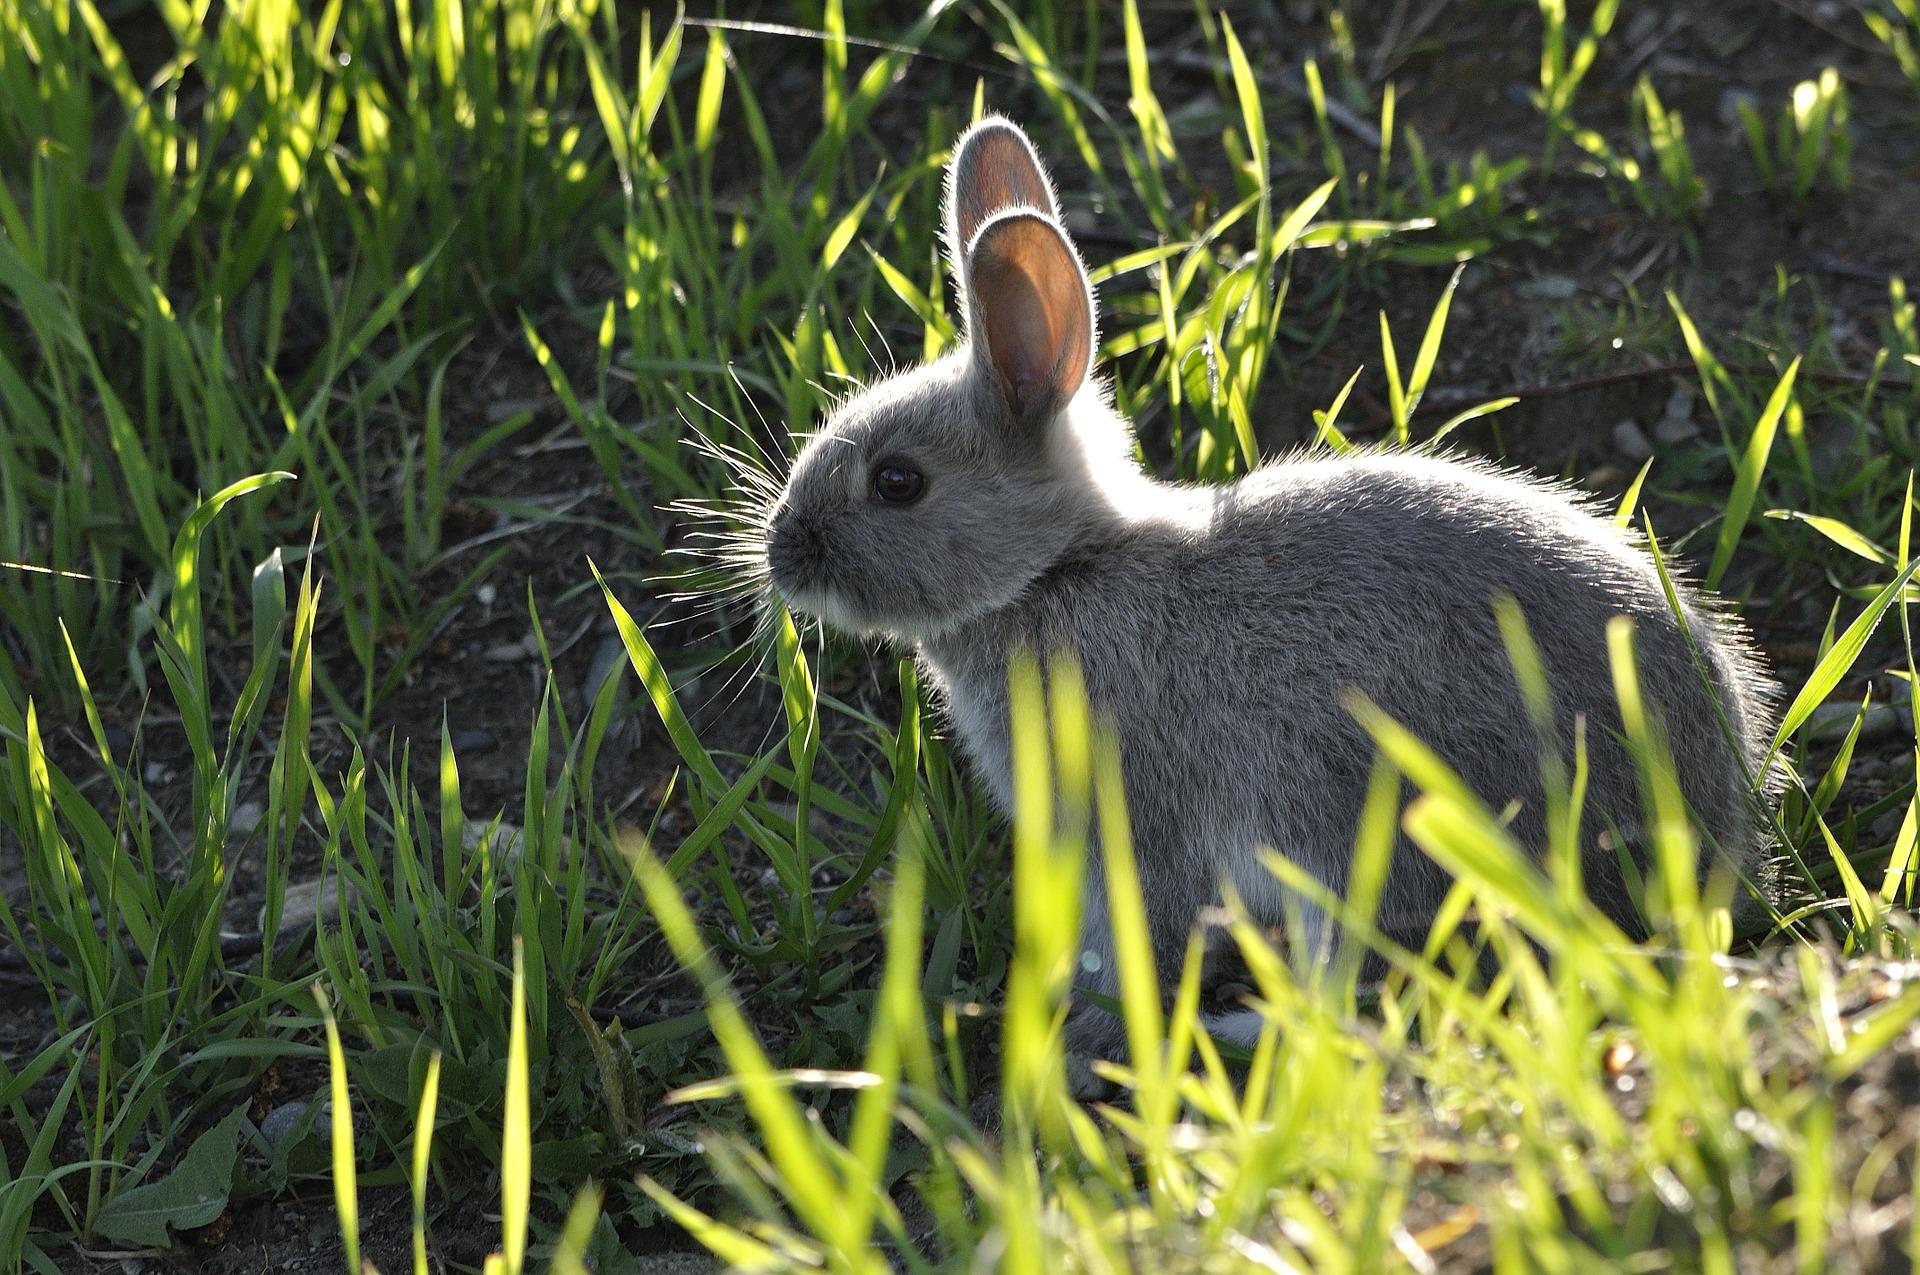 The 5 Best Rabbit Repellent Sprays: These Rabbit Deterrent Spray ...